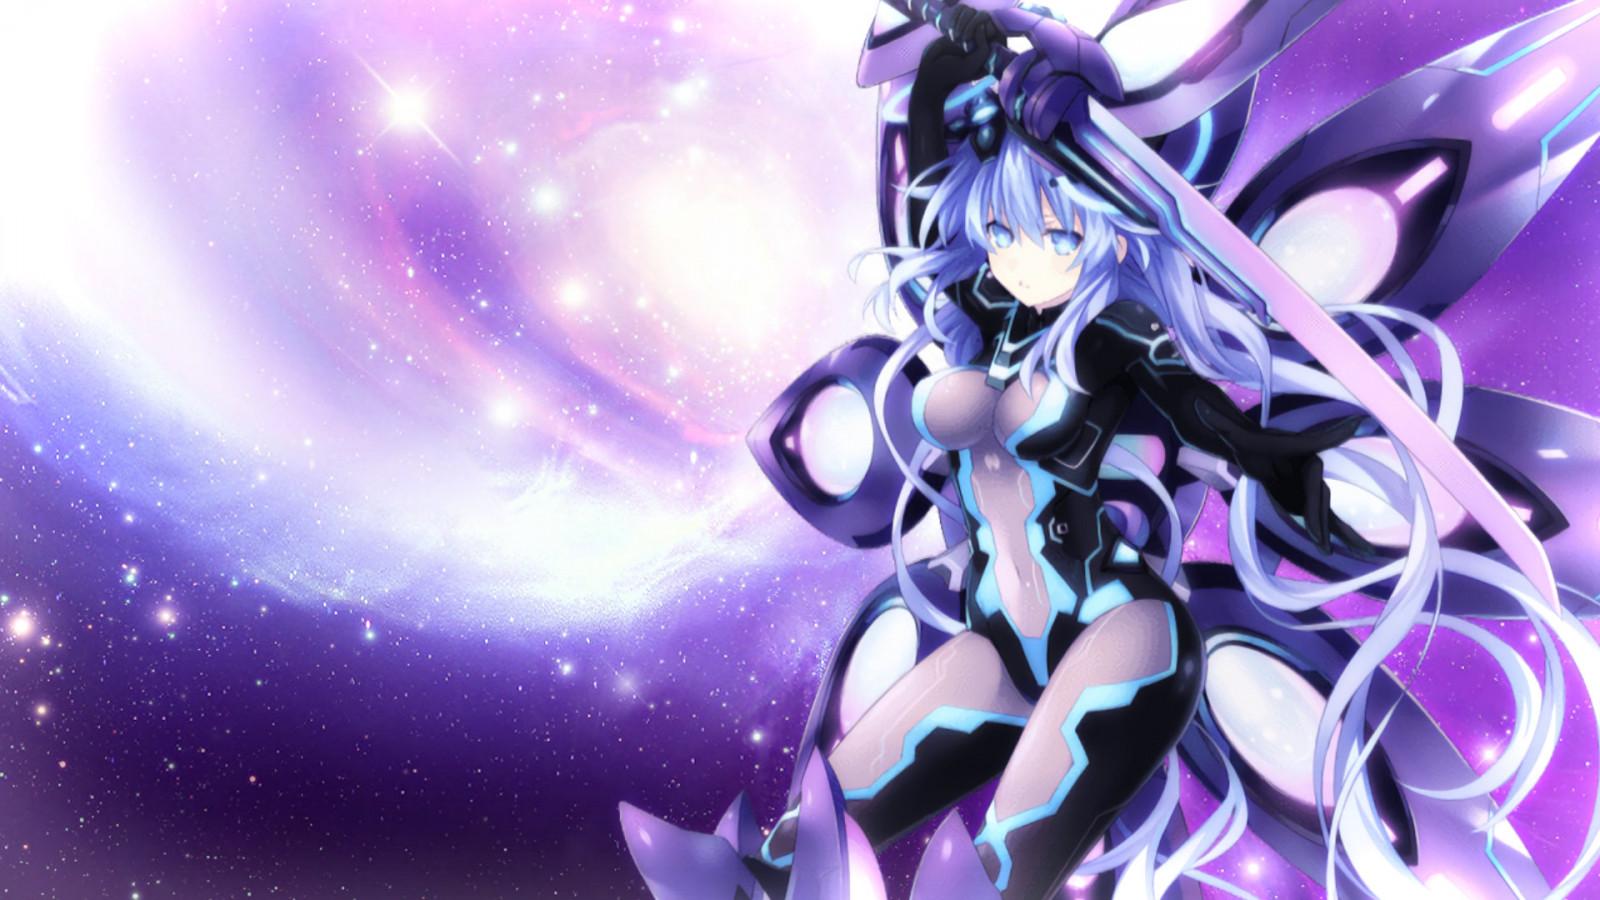 Wallpaper : anime, girl 1920x1080 - remilia255 - 1238811 ...